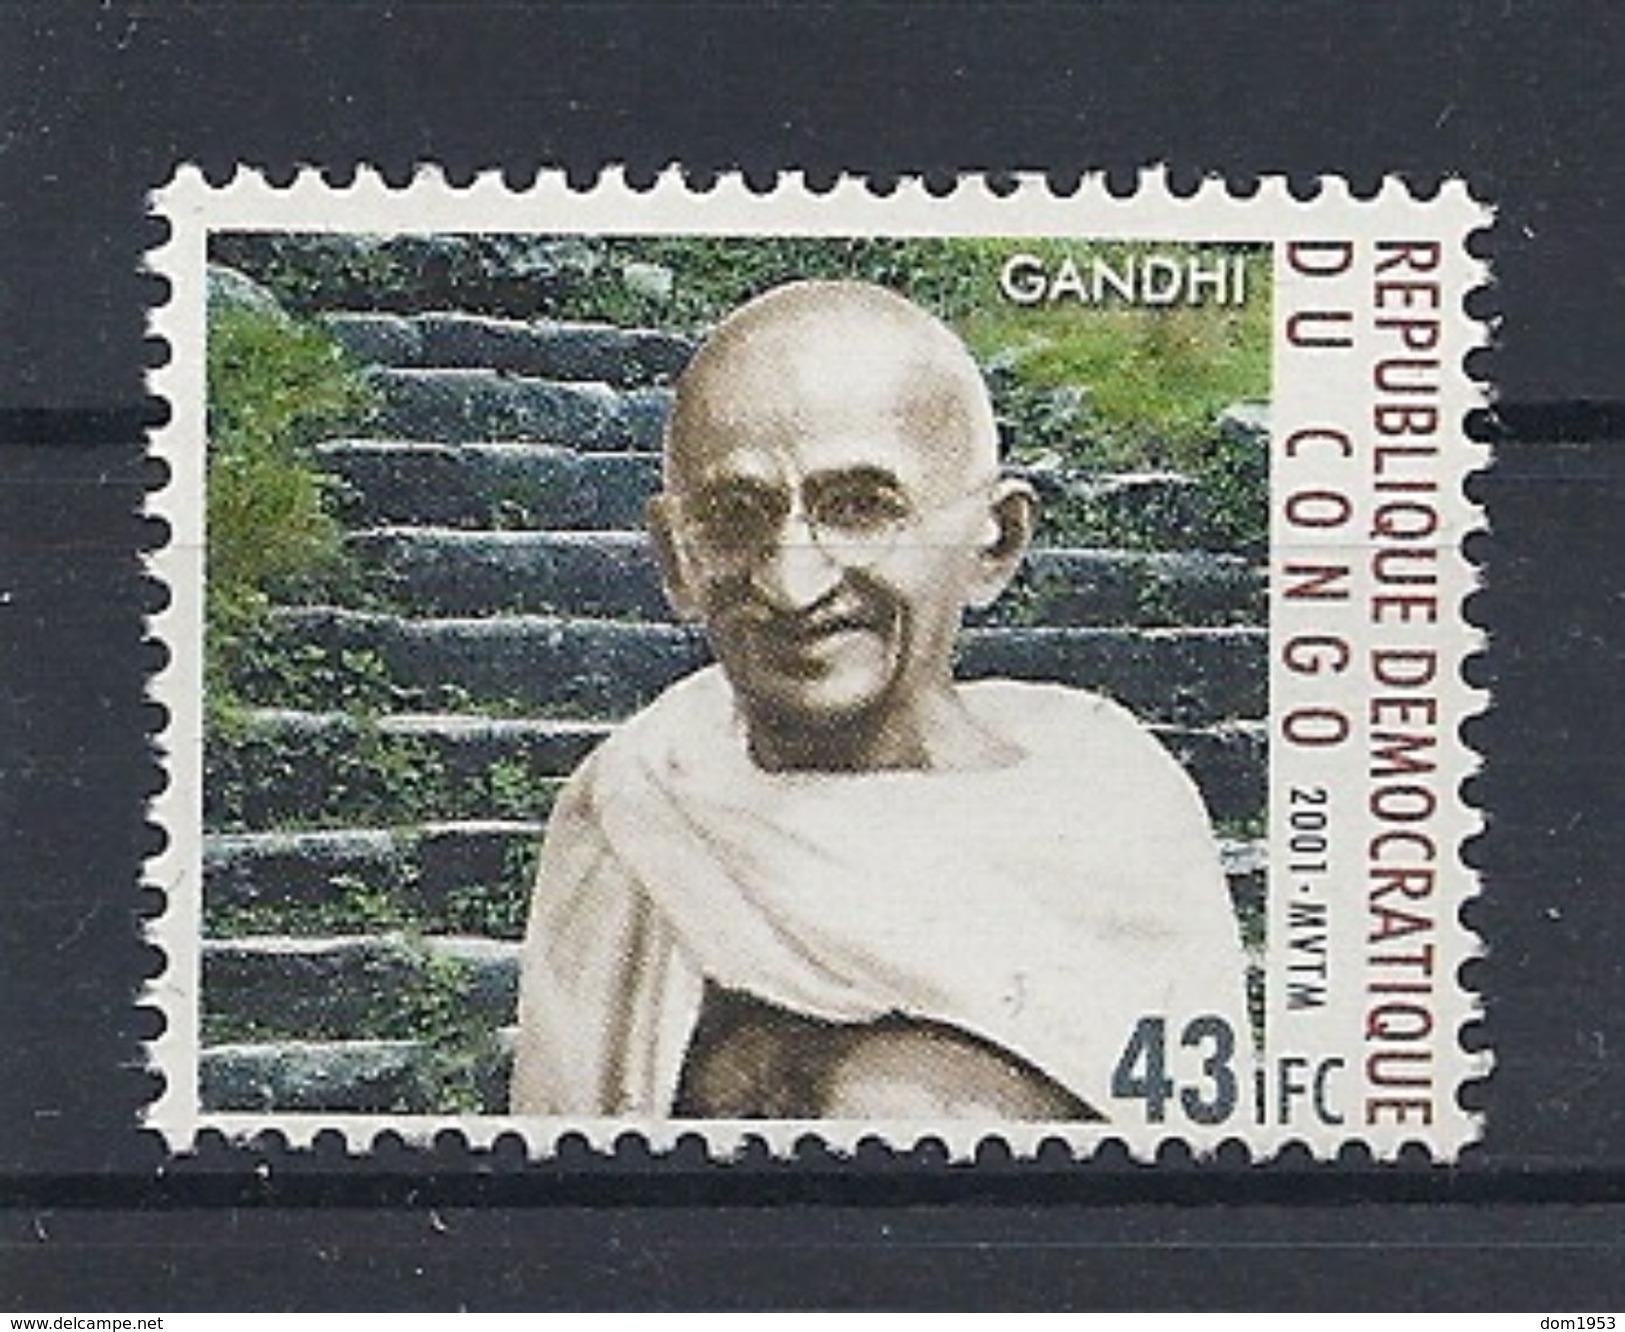 CONGO DEMOCRATIQUE 1712 - GANDHI - Mahatma Gandhi